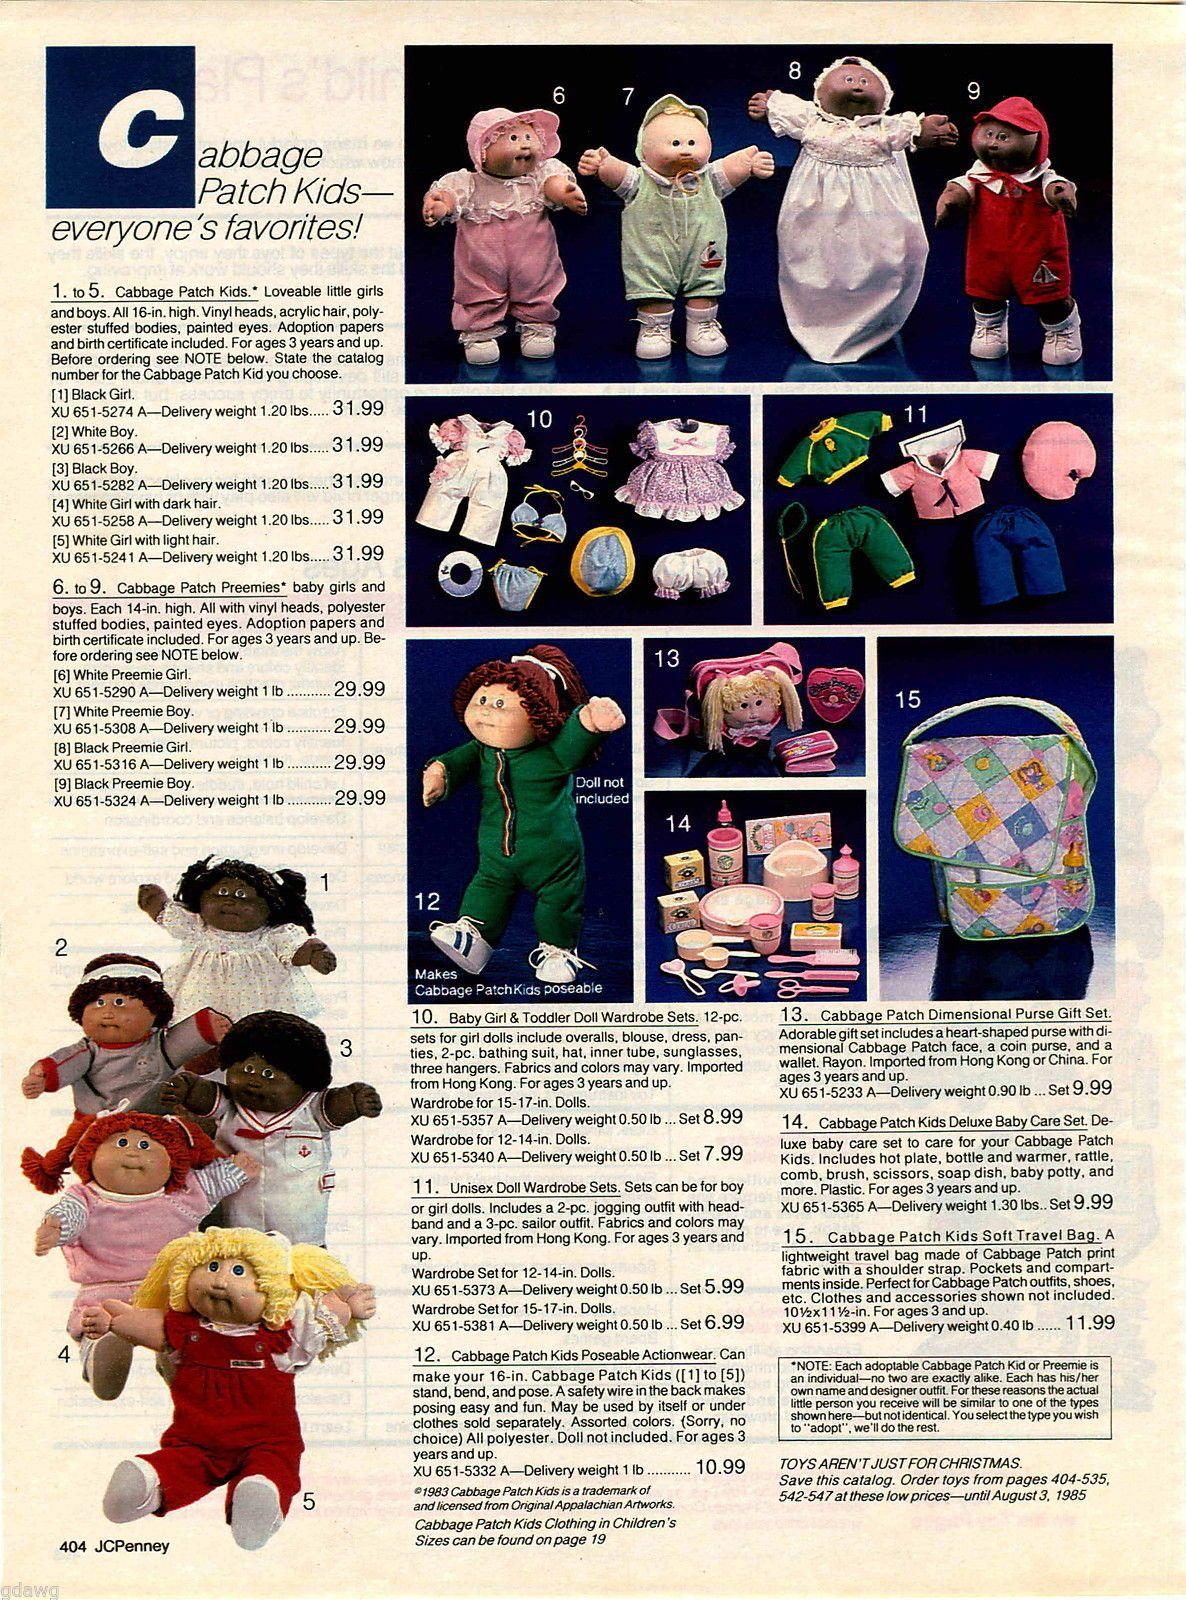 1984 Advert Cabbage Patch Kids Doll Dolls Black Girl White Boy Baby Babies Cloth Cabbage Patch Kids Cabbage Patch Kids Dolls Patch Kids